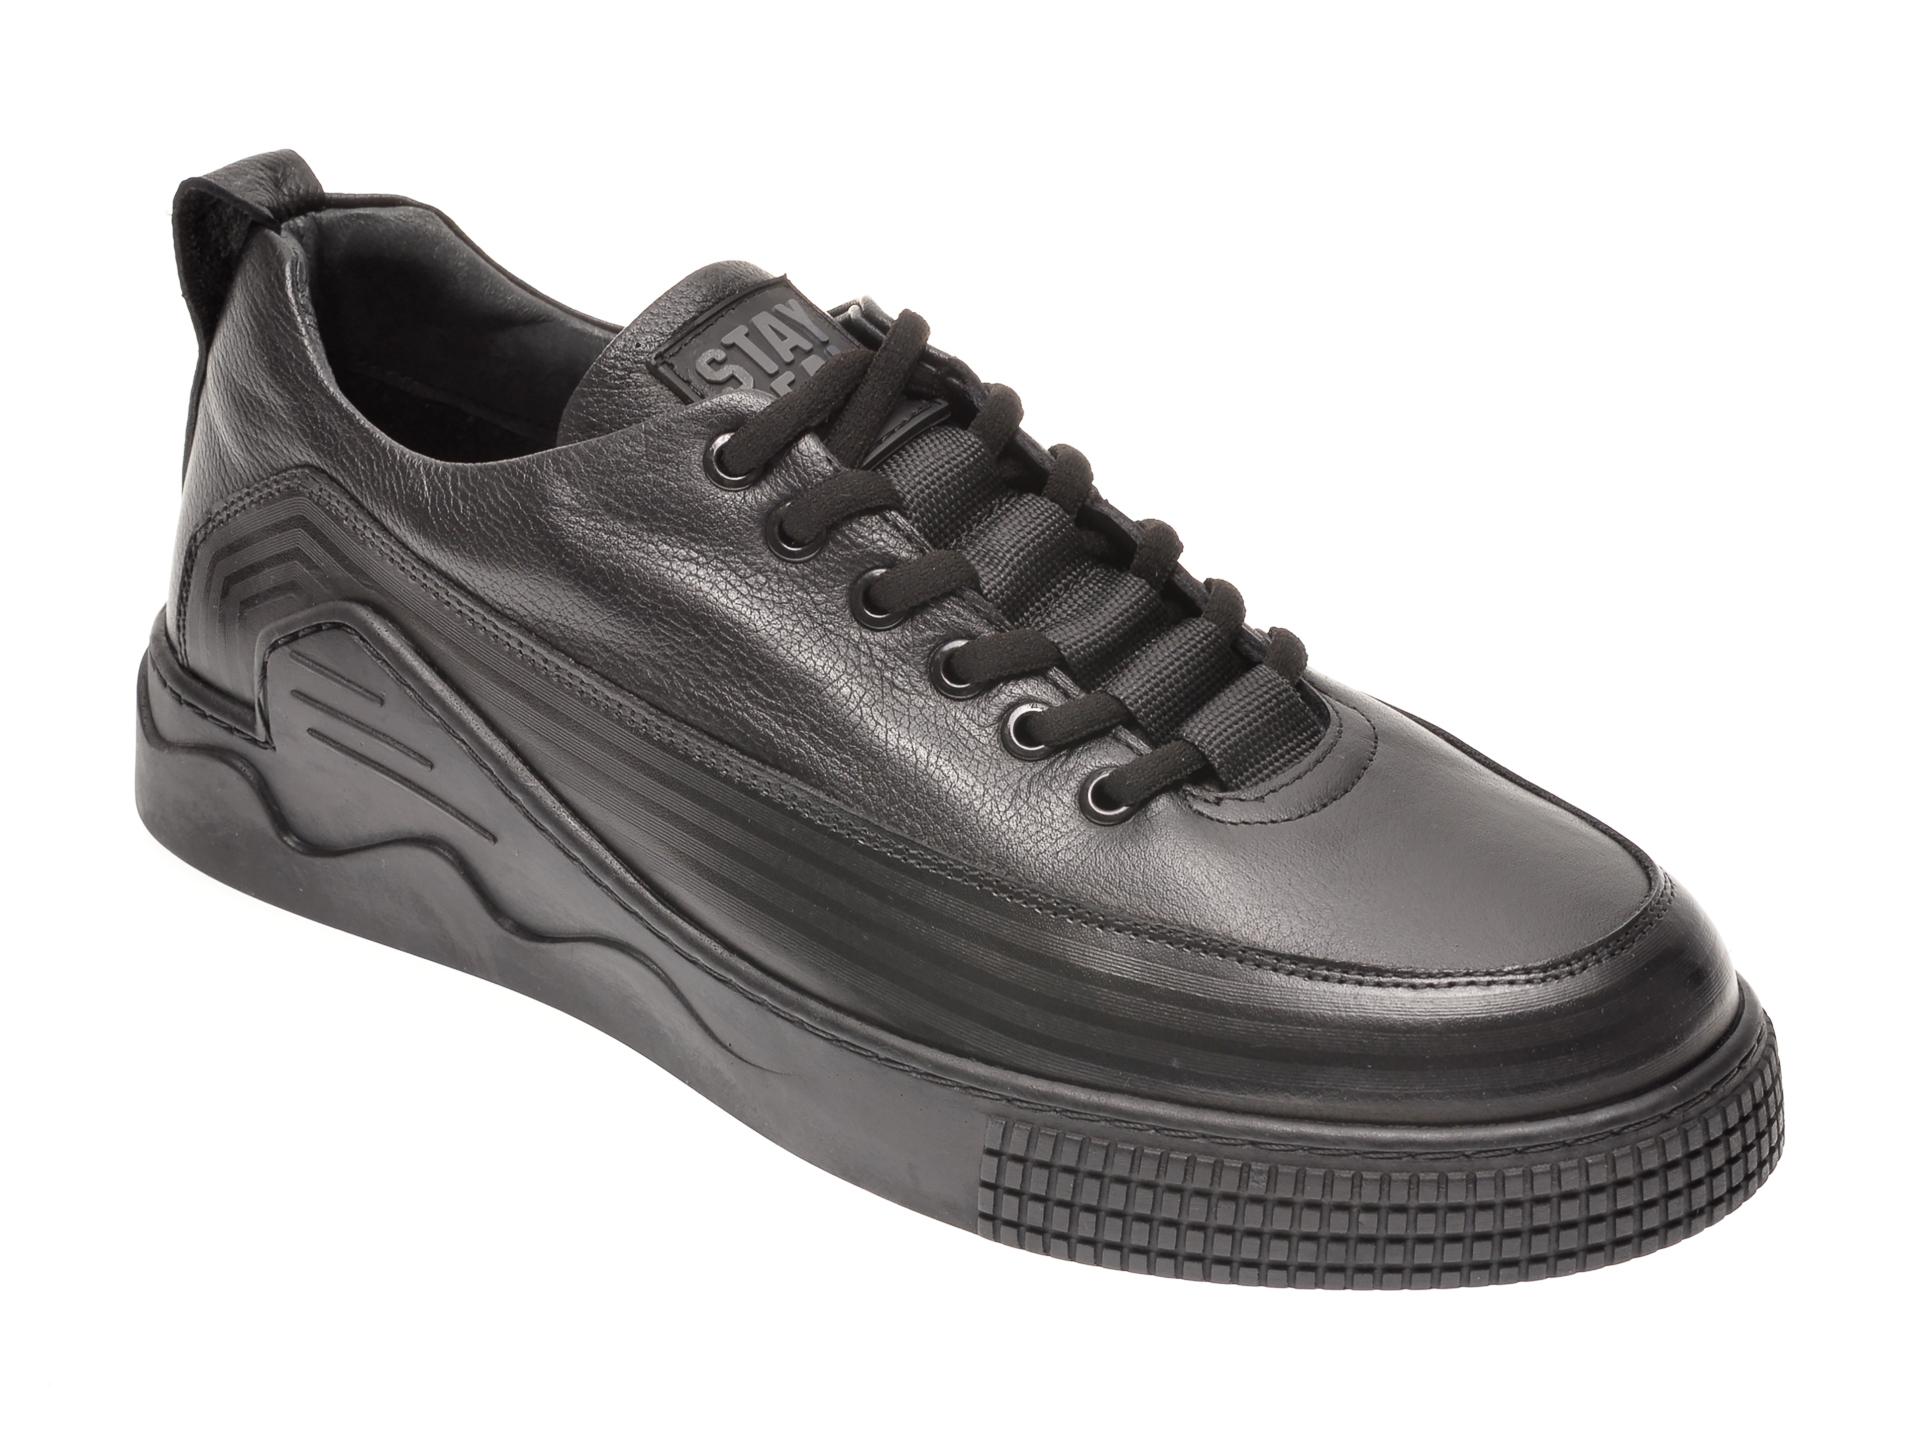 Pantofi OTTER negri, 66701, din piele naturala New